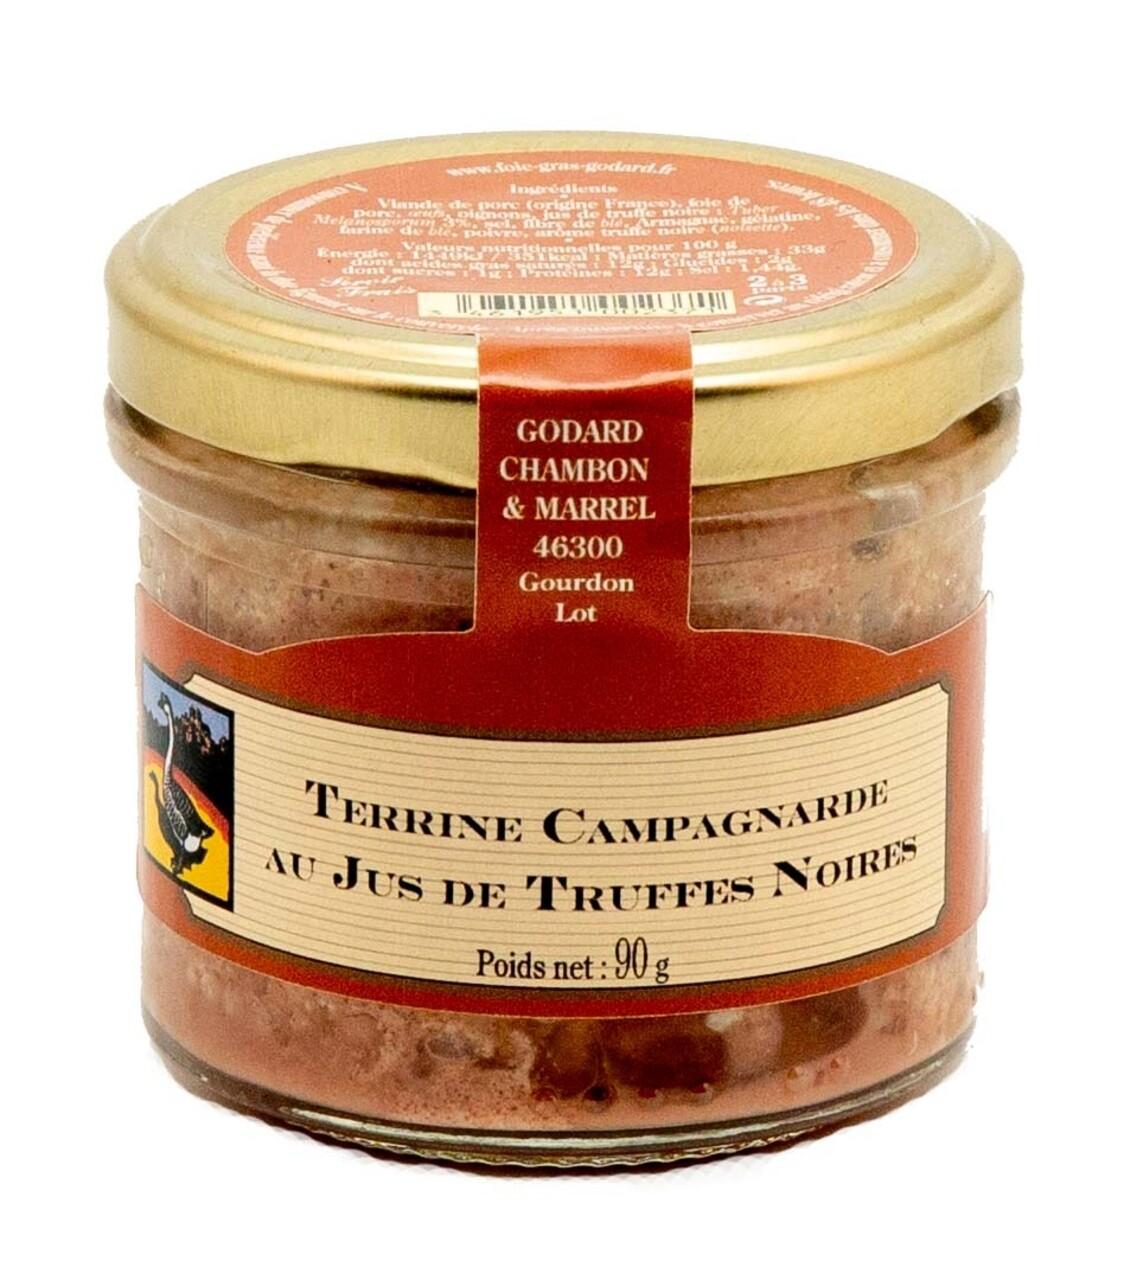 Terina taraneasca cu suc de trufe negre, Godard Chambon & Marell, 90g